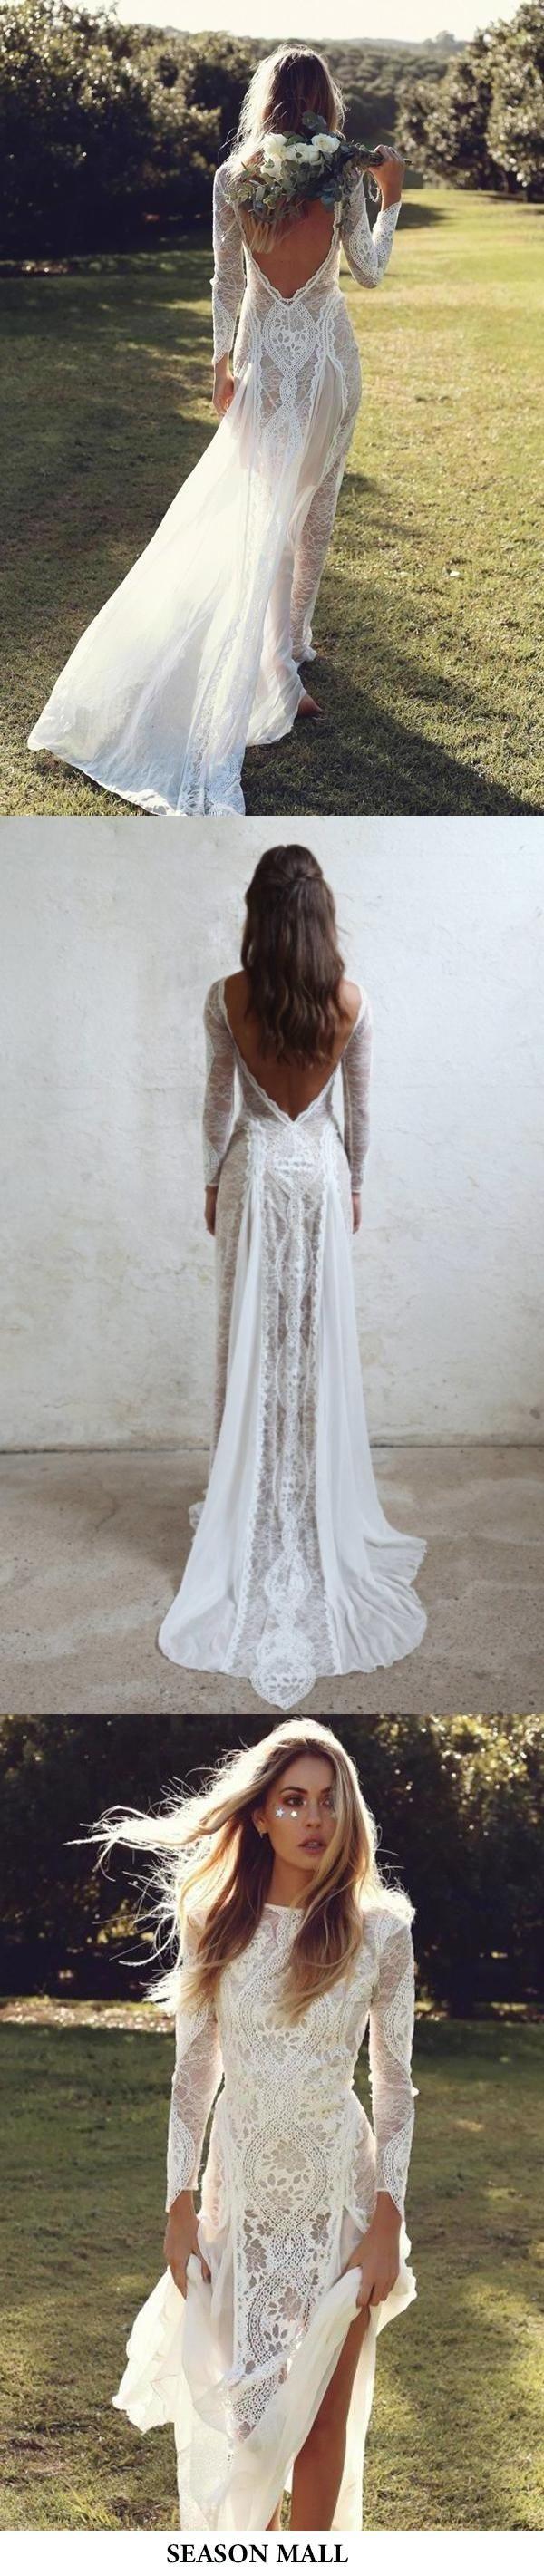 Ivory Sheath Brush Train Long Sleeve Backless Lace Wedding Dress Beach Wedding Dress Backless Lace Wedding Dress Wedding Dresses Lace Lace Beach Wedding Dress [ 2842 x 600 Pixel ]